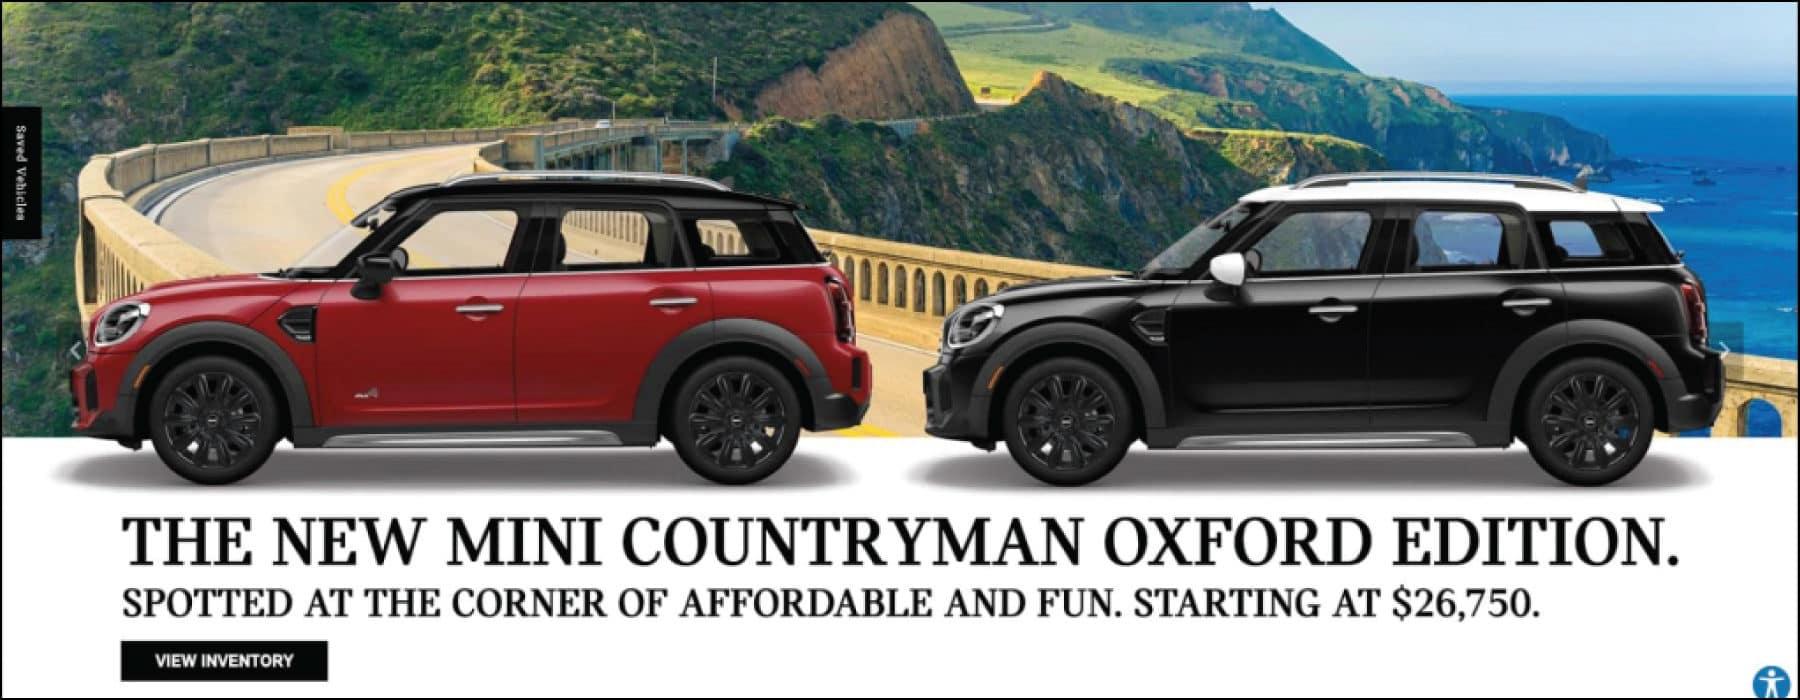 The new MINI Countryman Oxford Edition